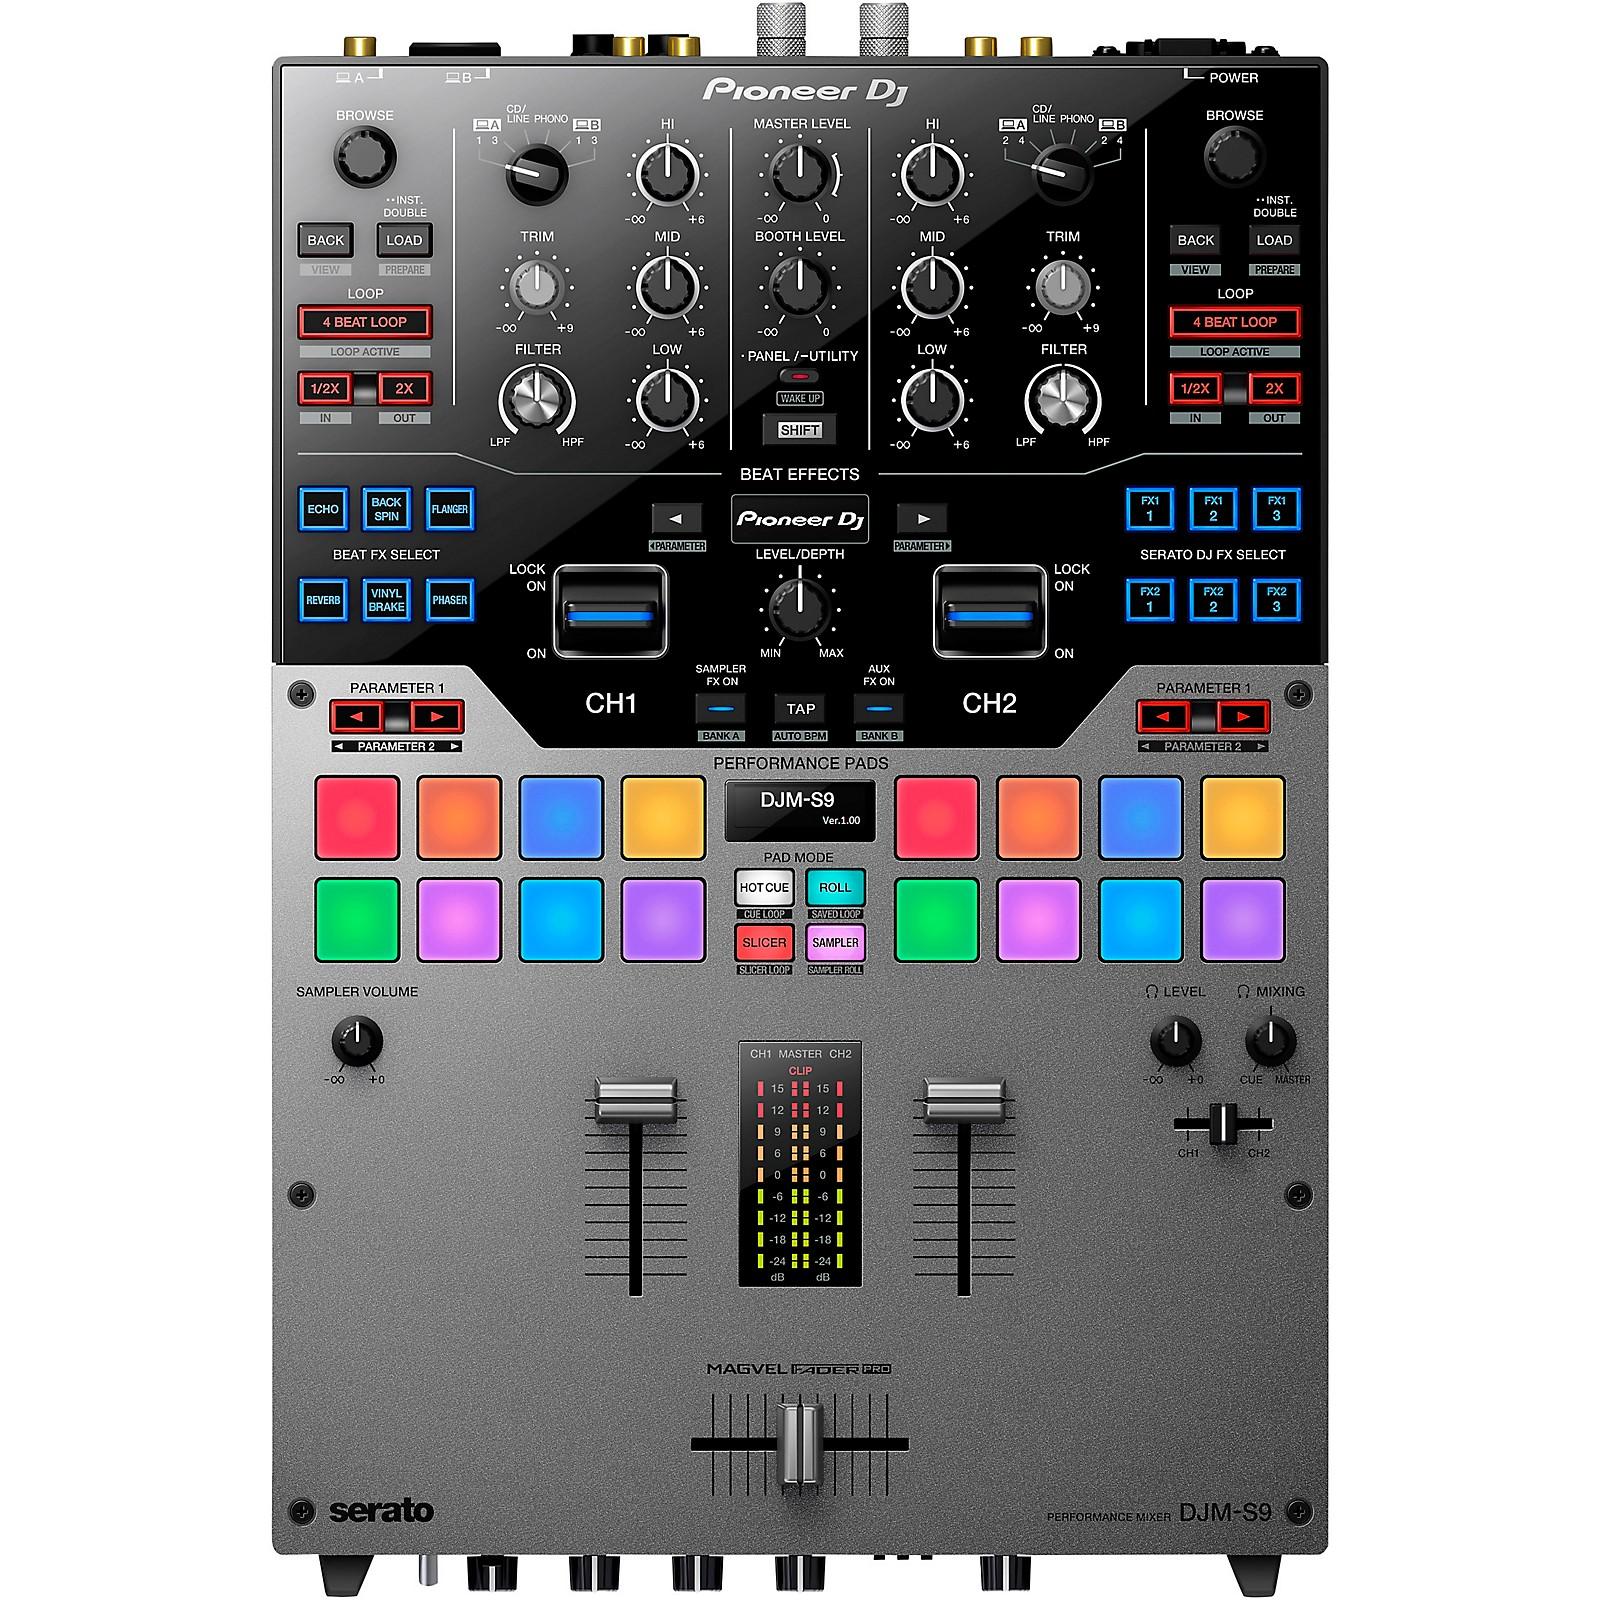 Pioneer DJM-S9 Limited Edition Silver 2-Channel Battle Mixer for Serato DJ Pro